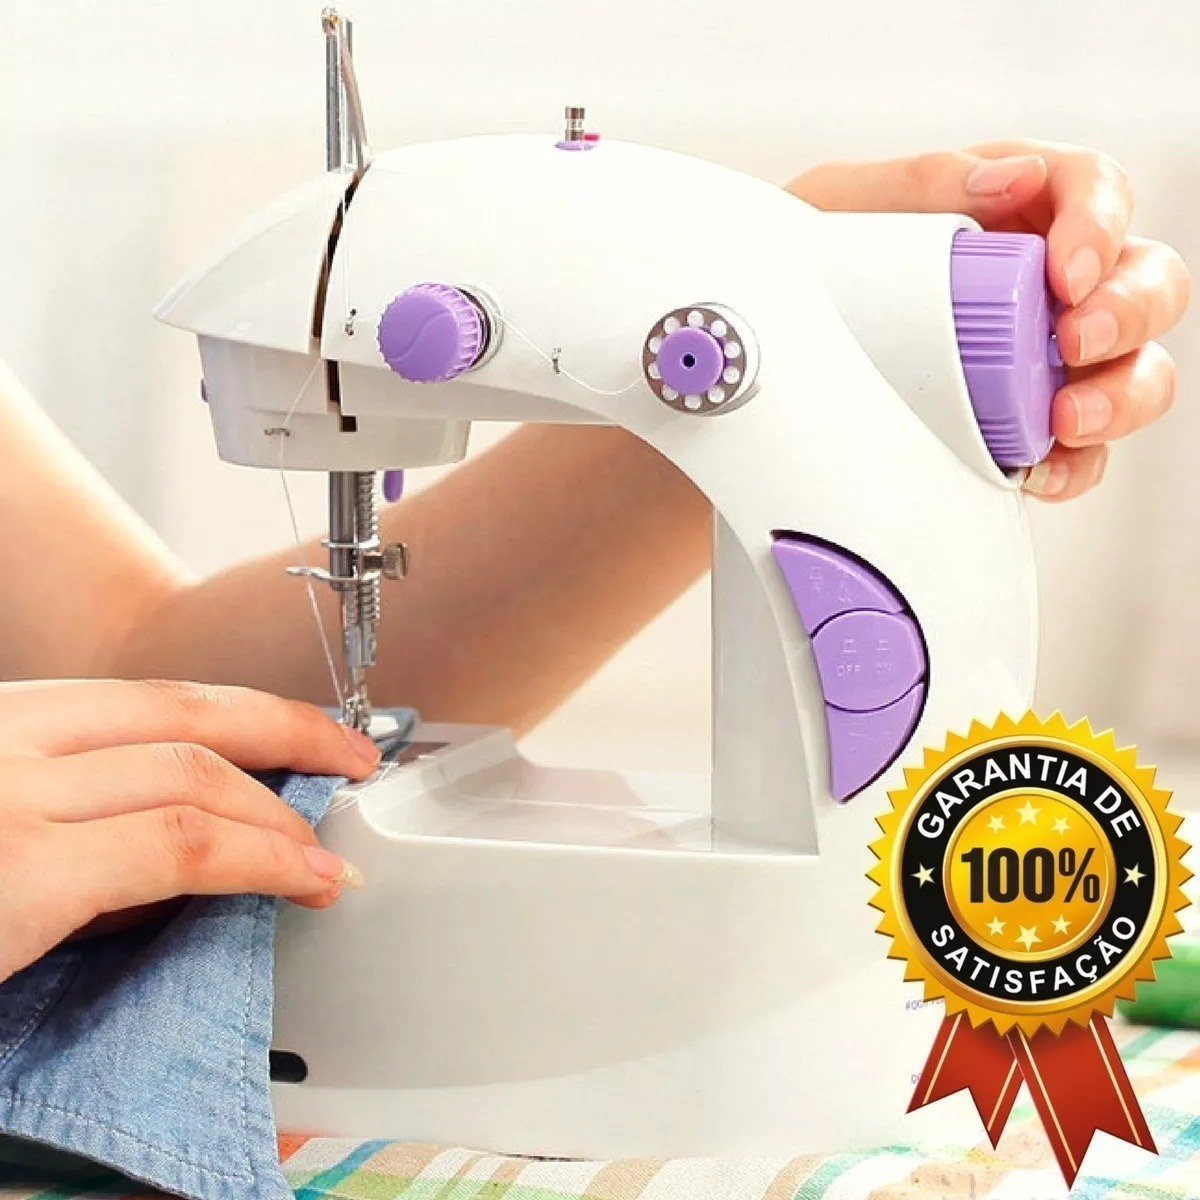 b269365b5 mini maquina d costura elétrica portátil bivolt frete grátis. Carregando  zoom.